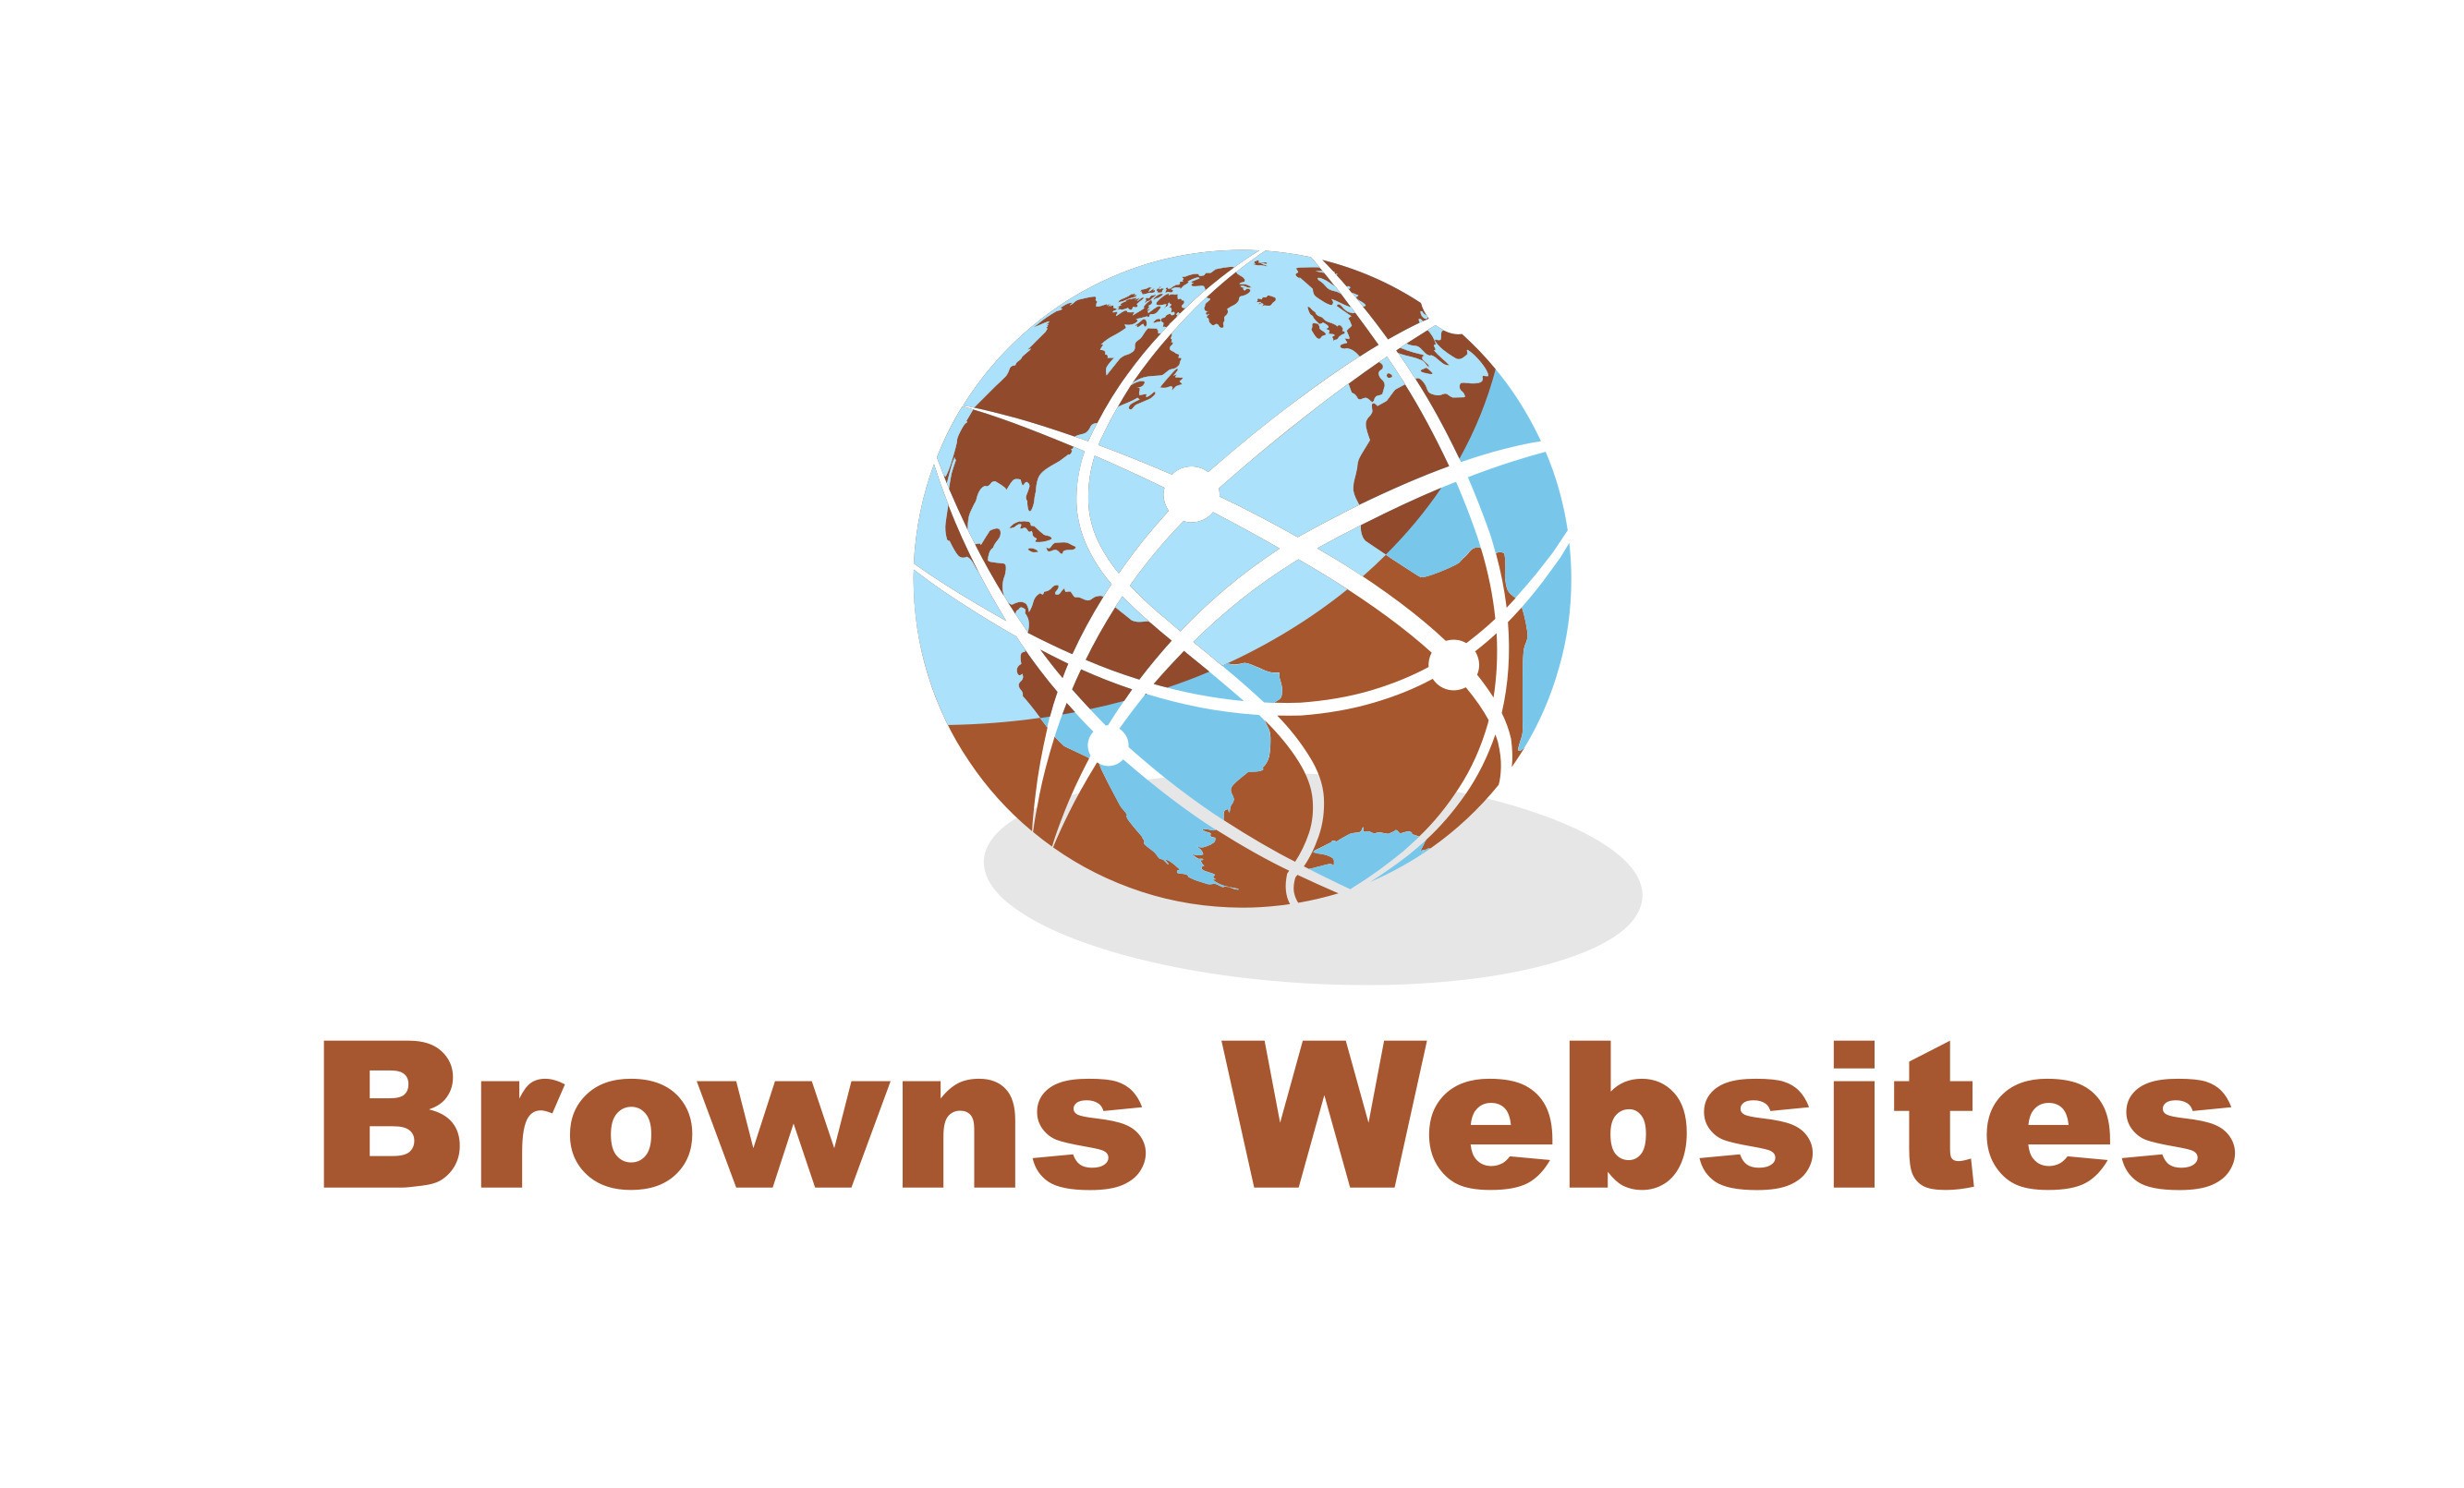 Browns Websites